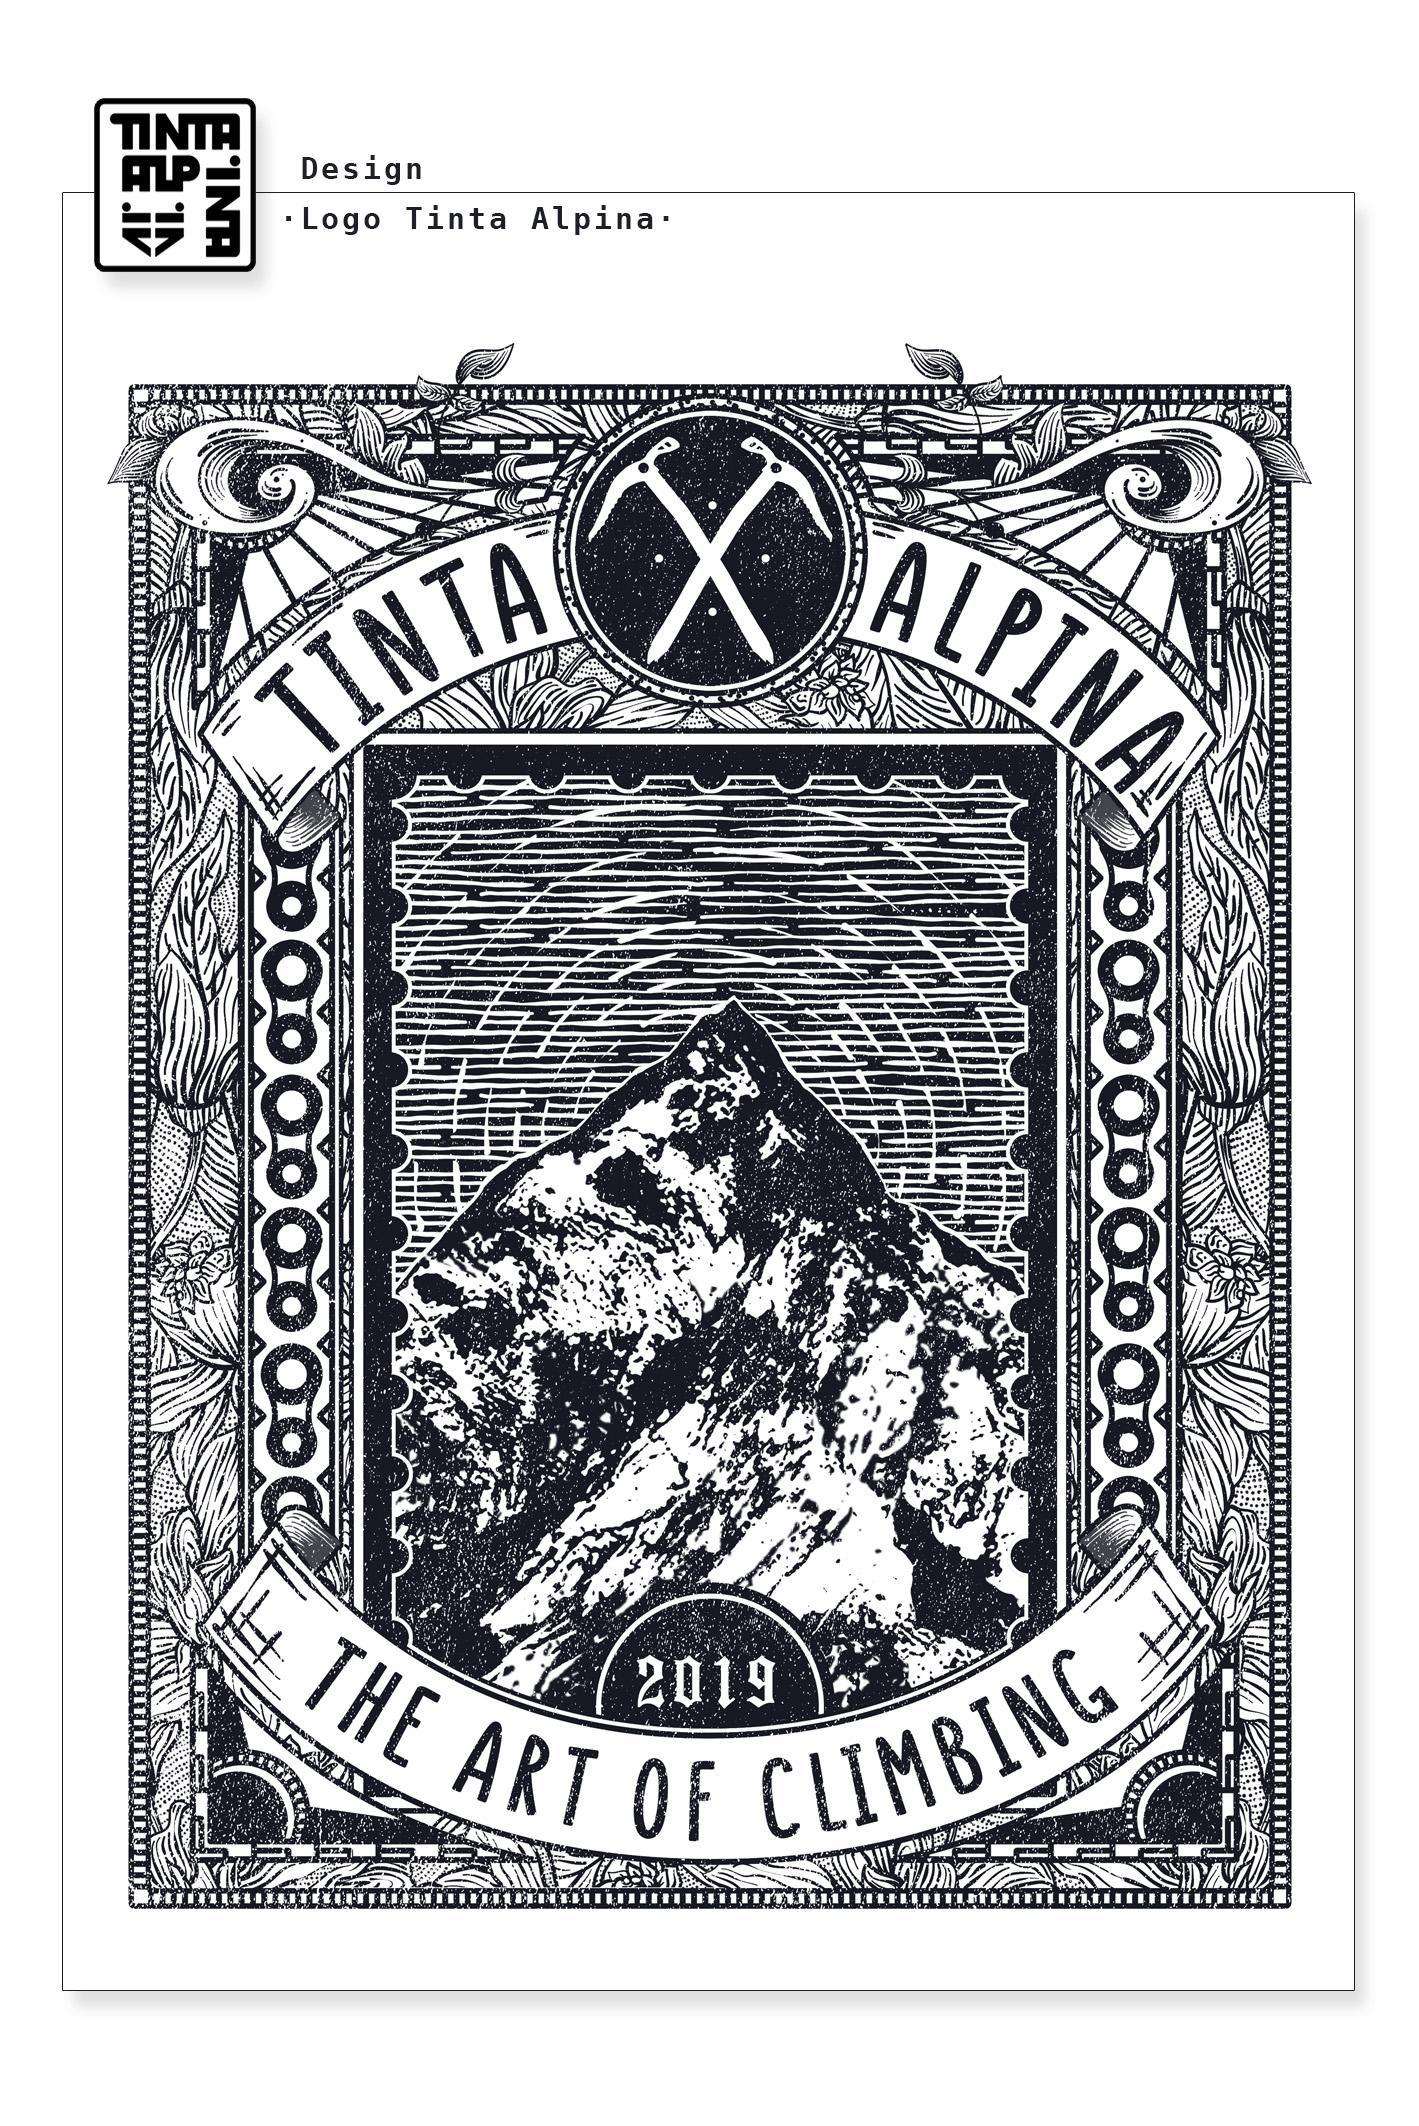 Logo Tinta Alpina